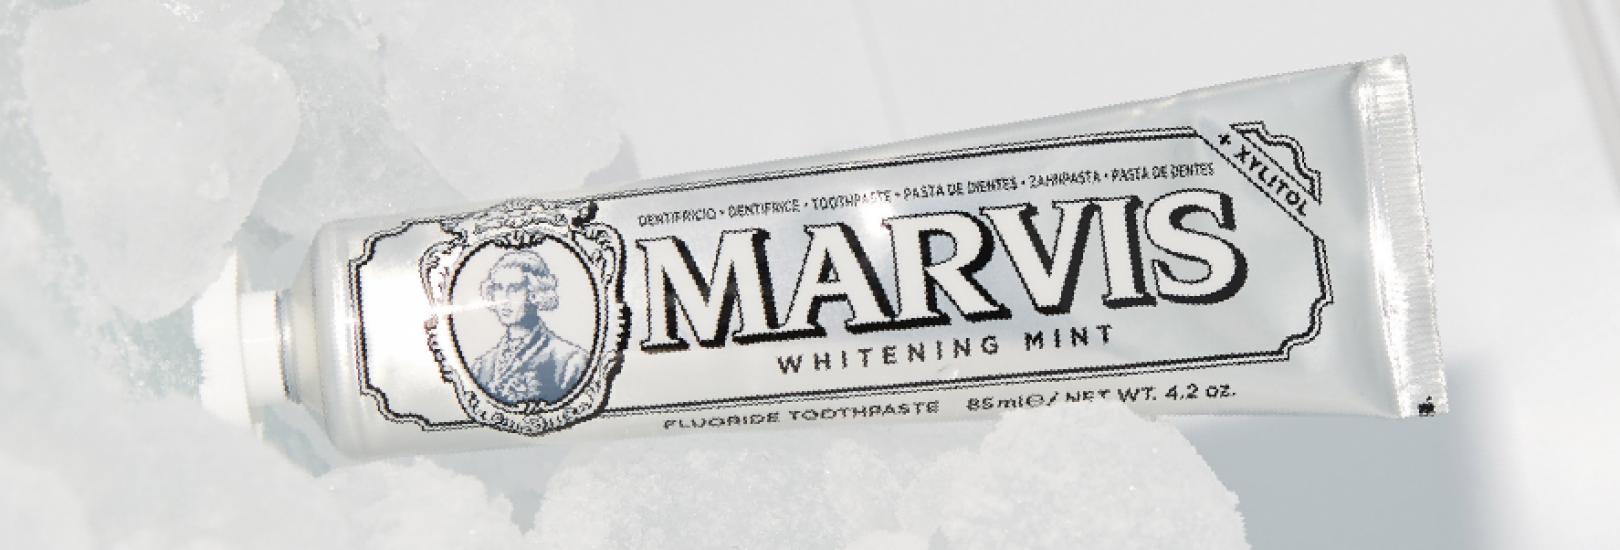 banner-whitening